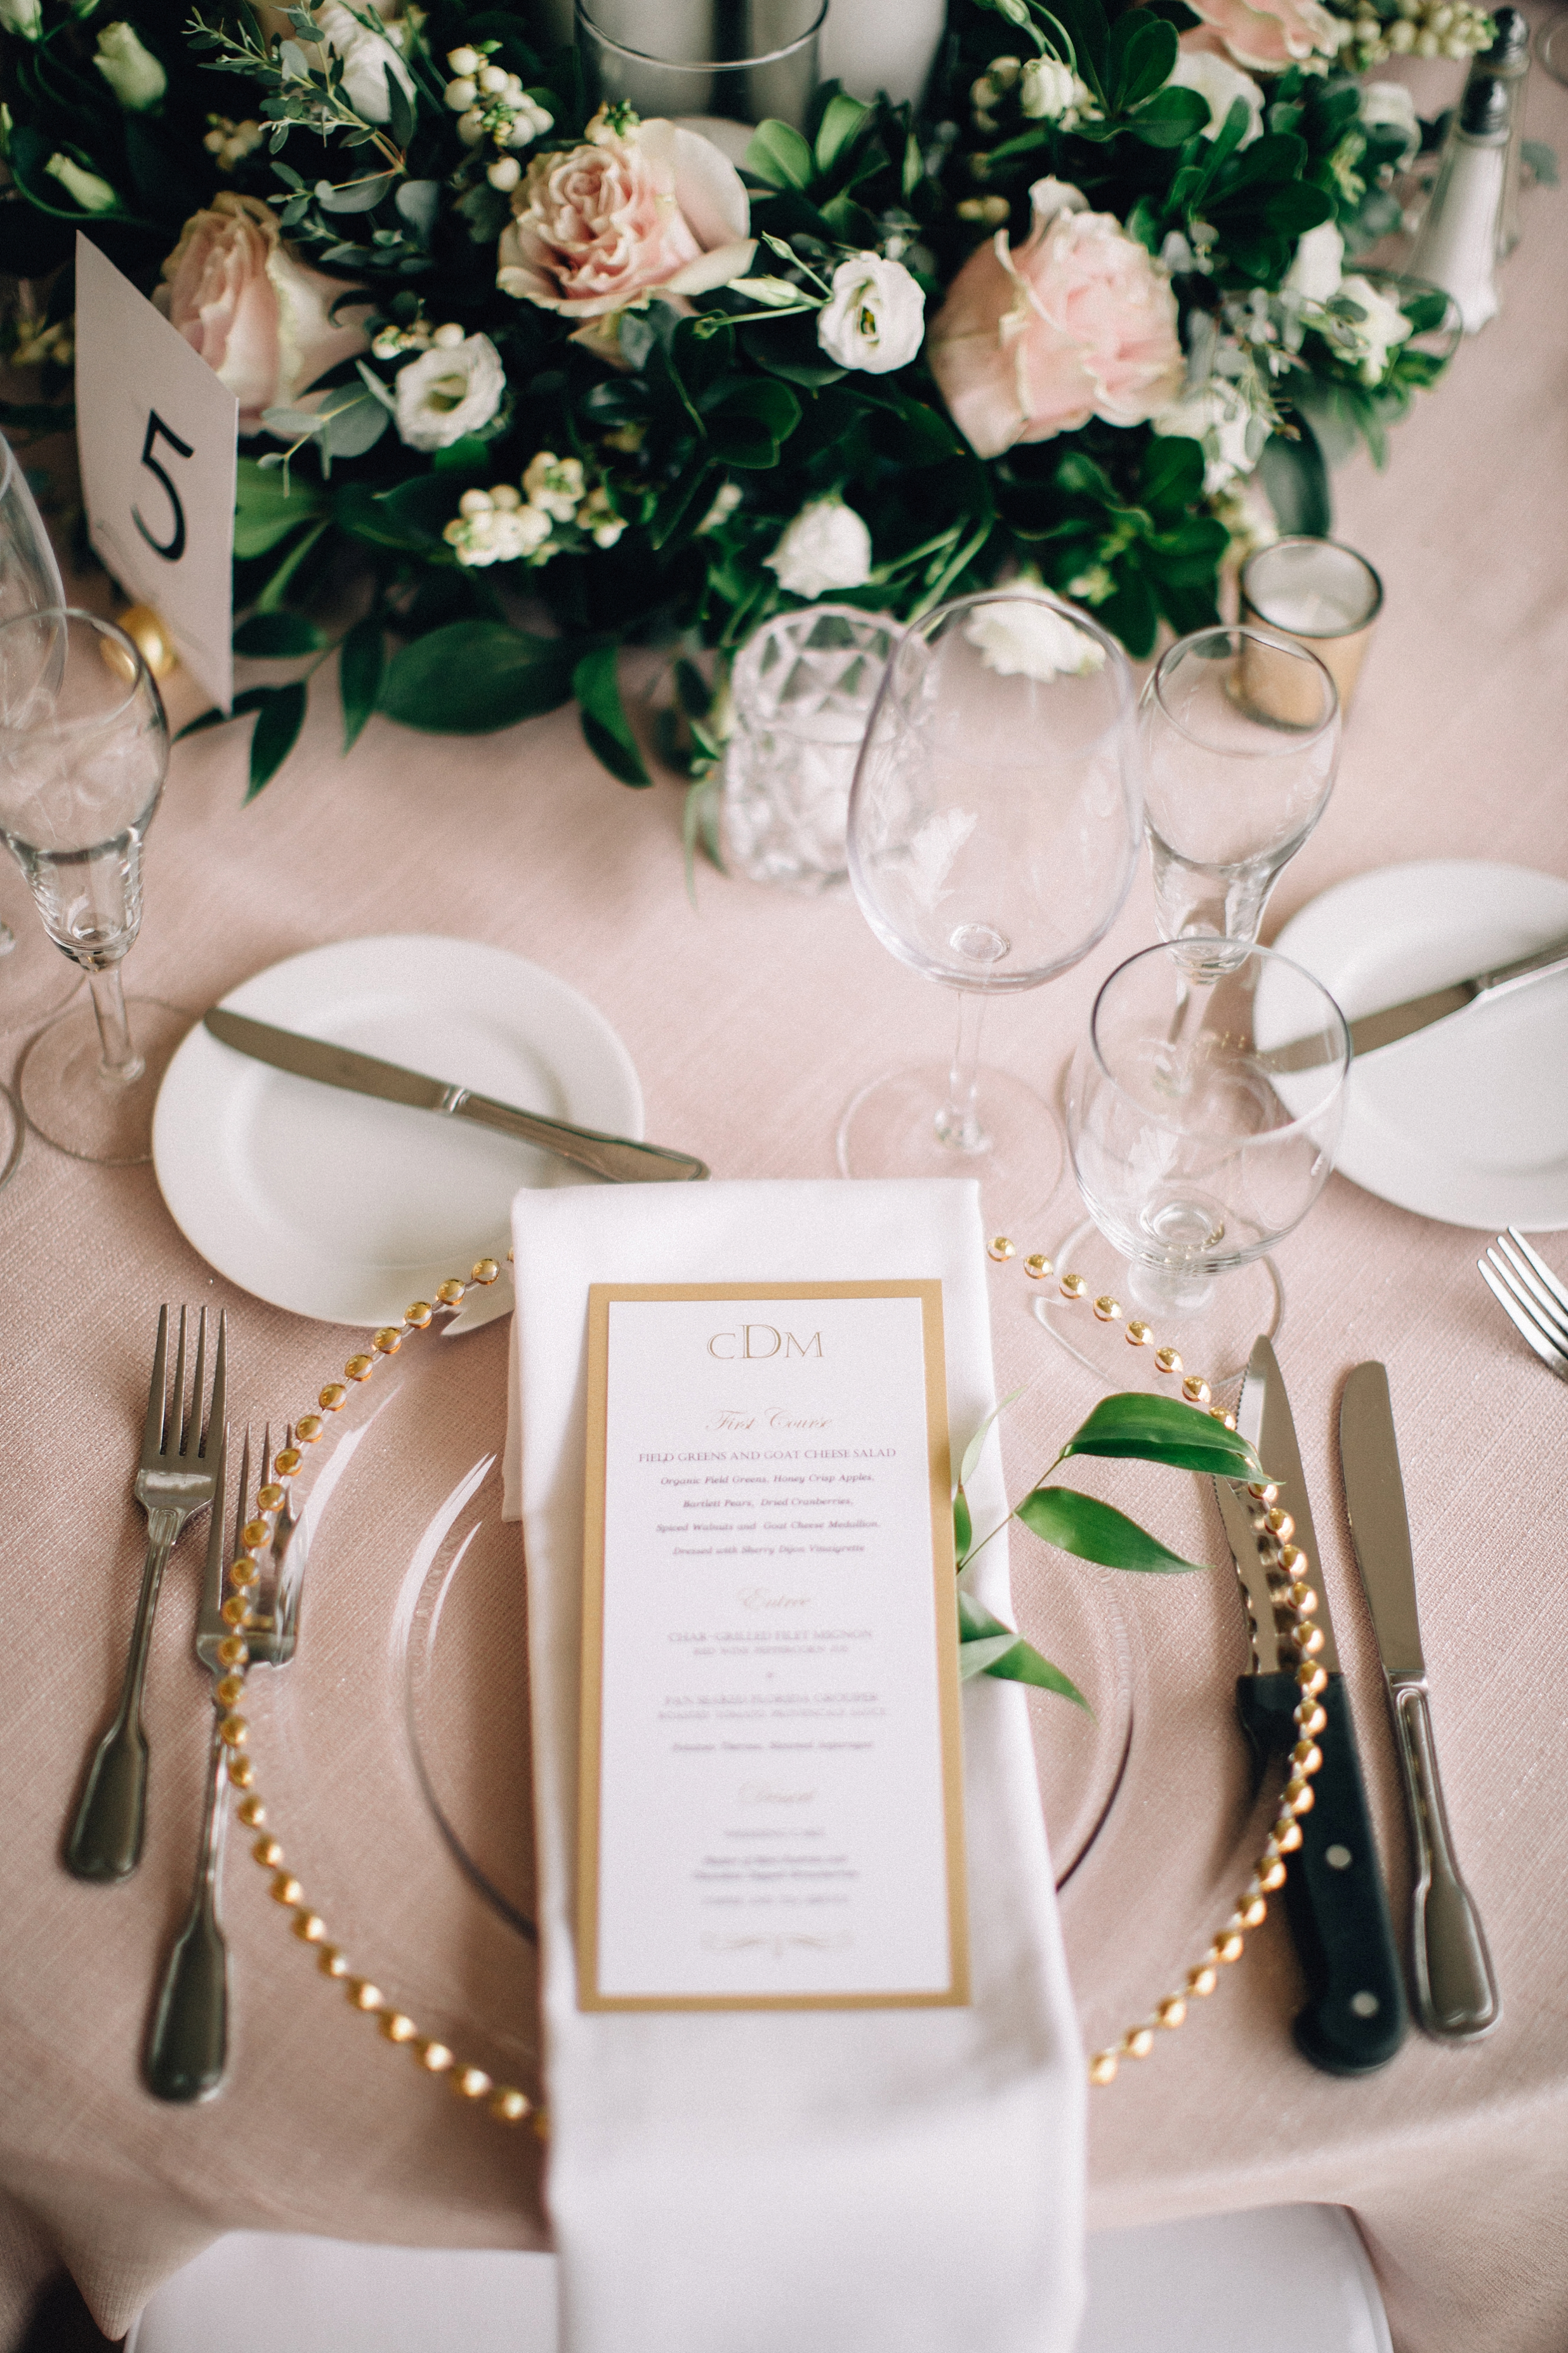 rumson-tented-wedding-nj-maine-conneticut-classic_0029.jpg